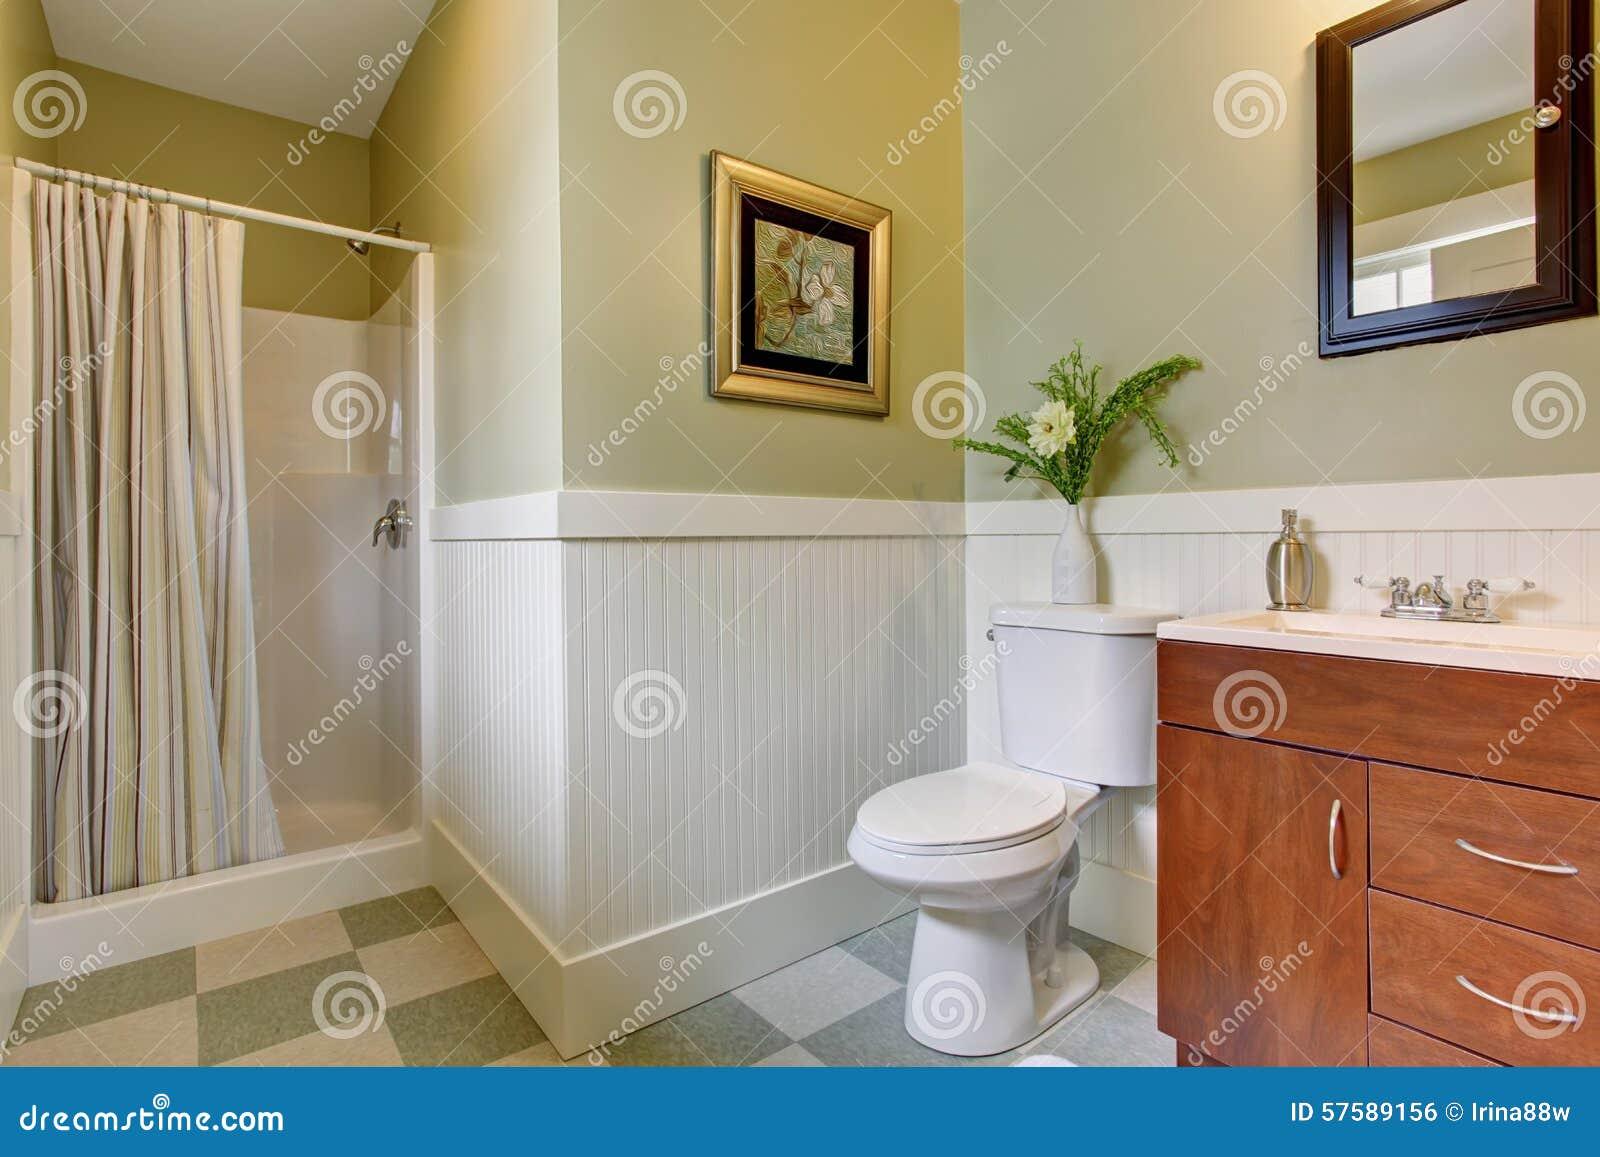 Bathroom Floor Tile With Green